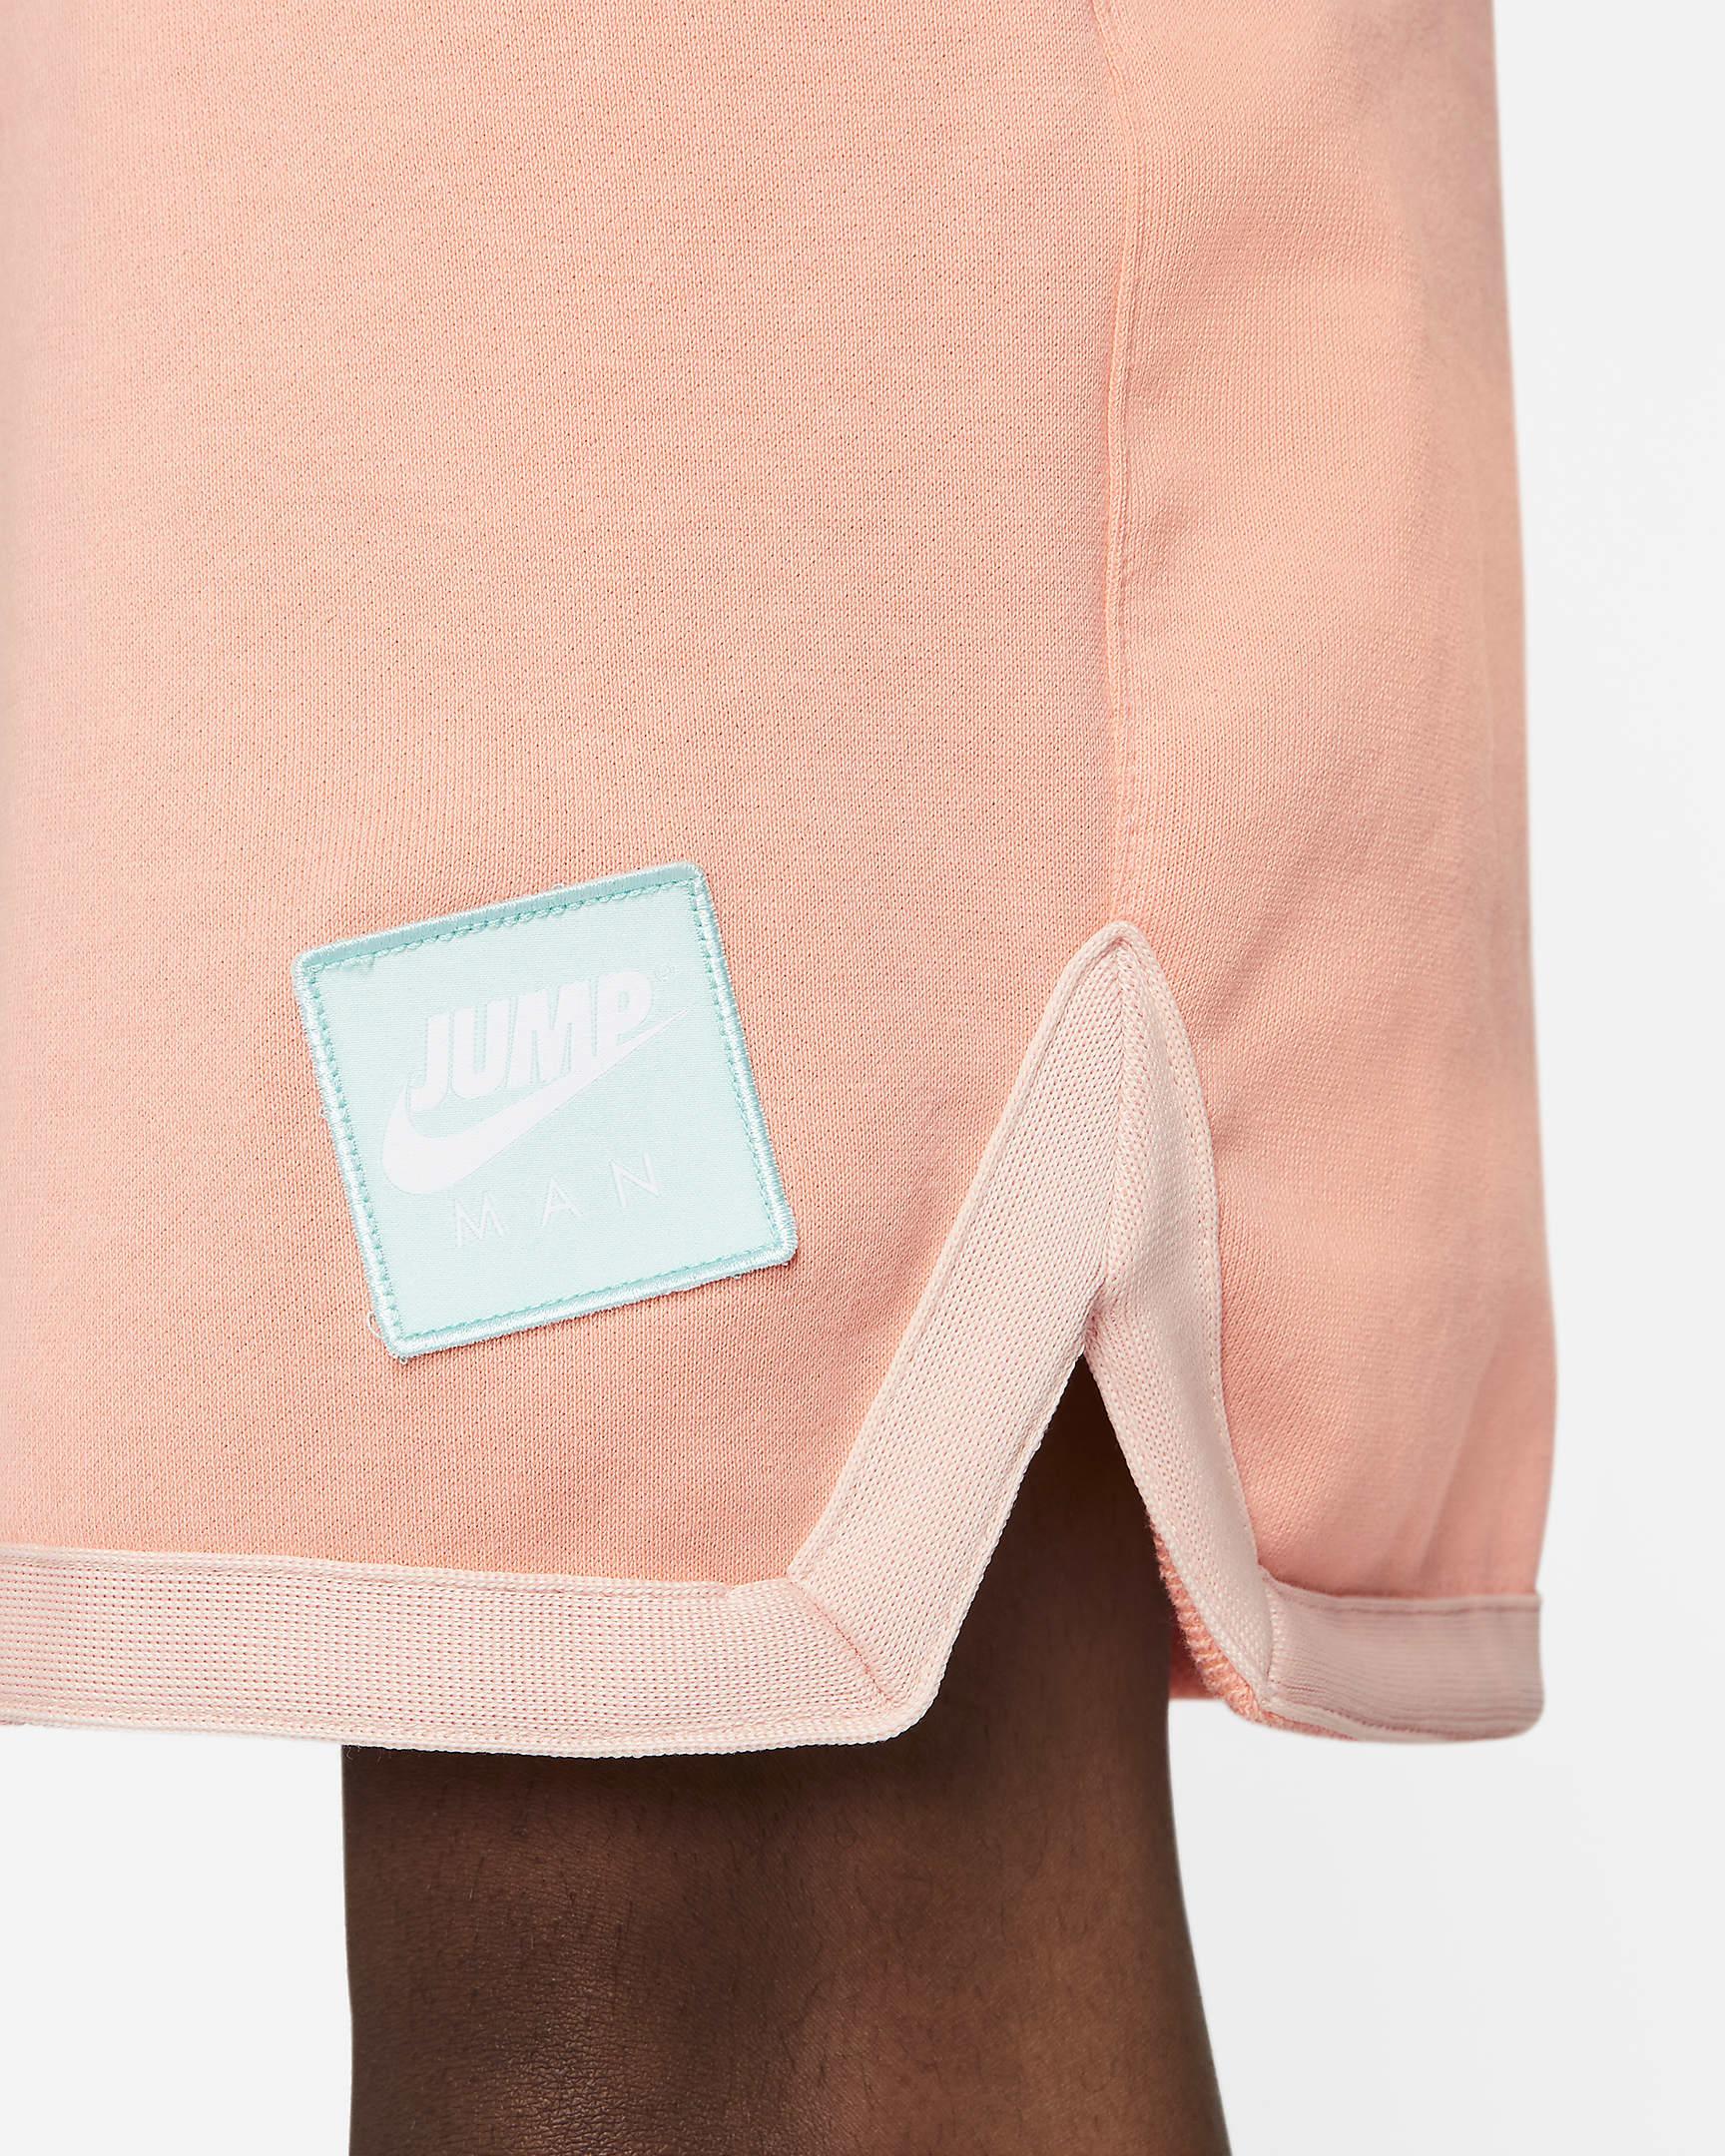 nike dunk high heels pink 2018 silver rose color